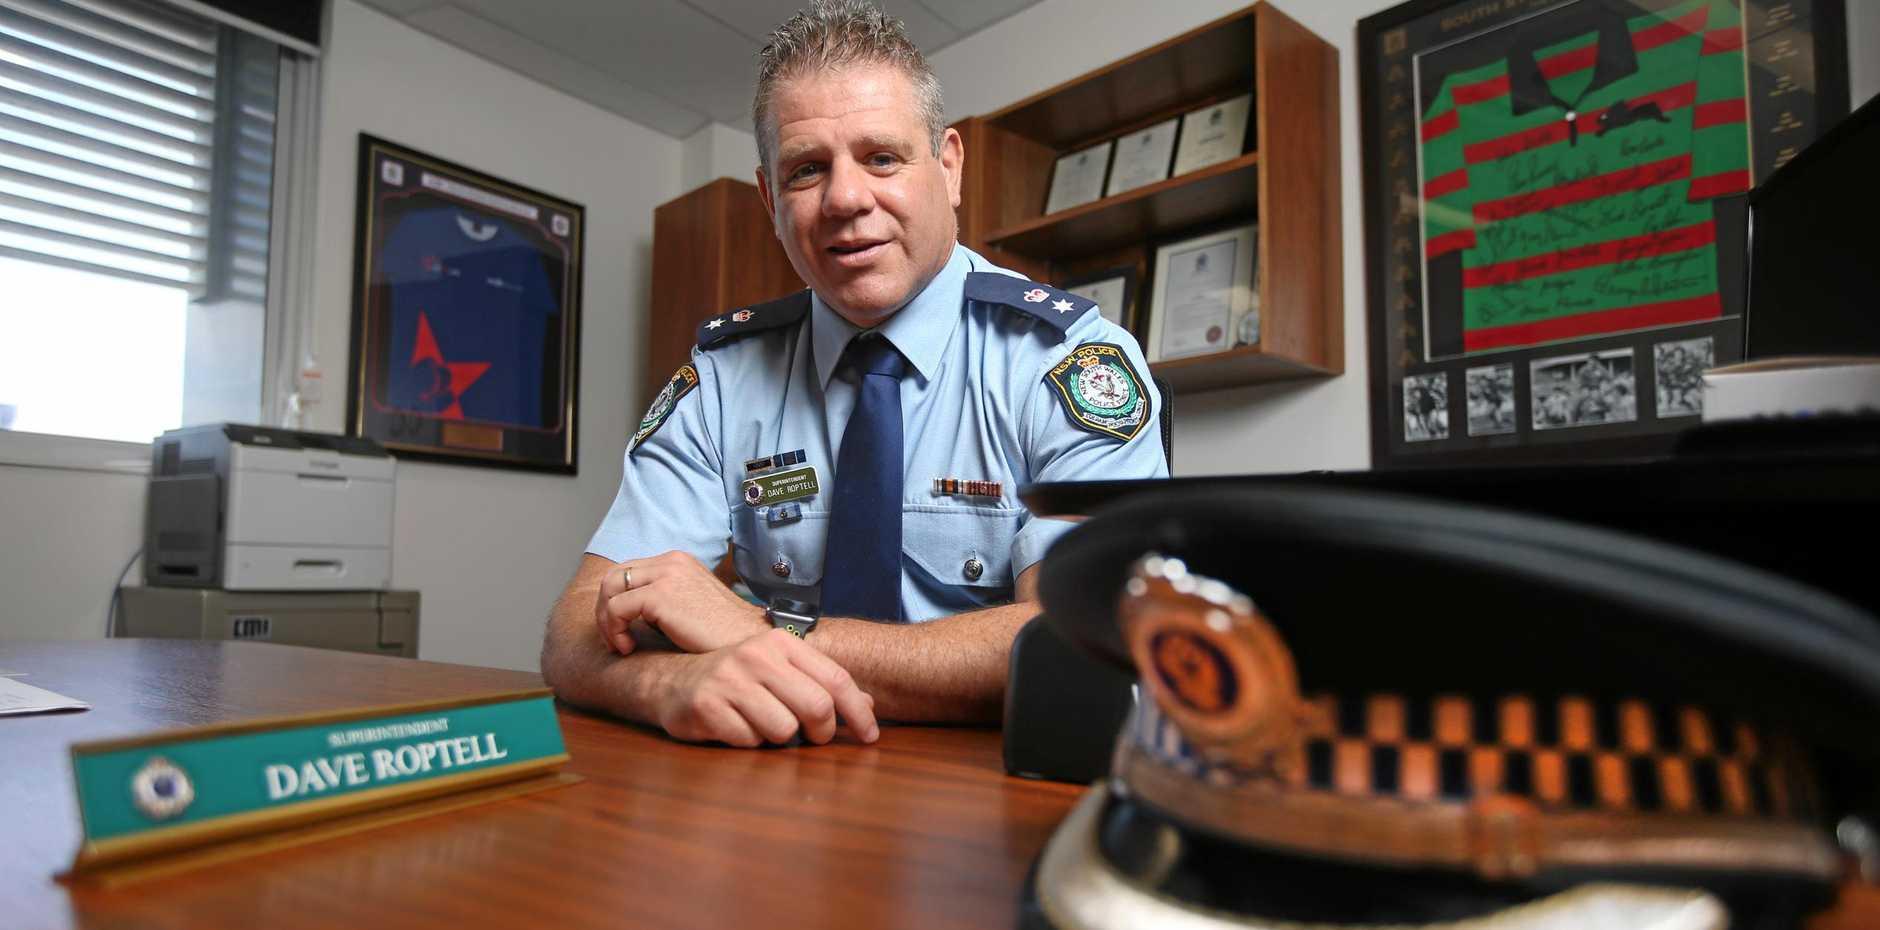 Tweed Byron Police Superintendent David Roptell